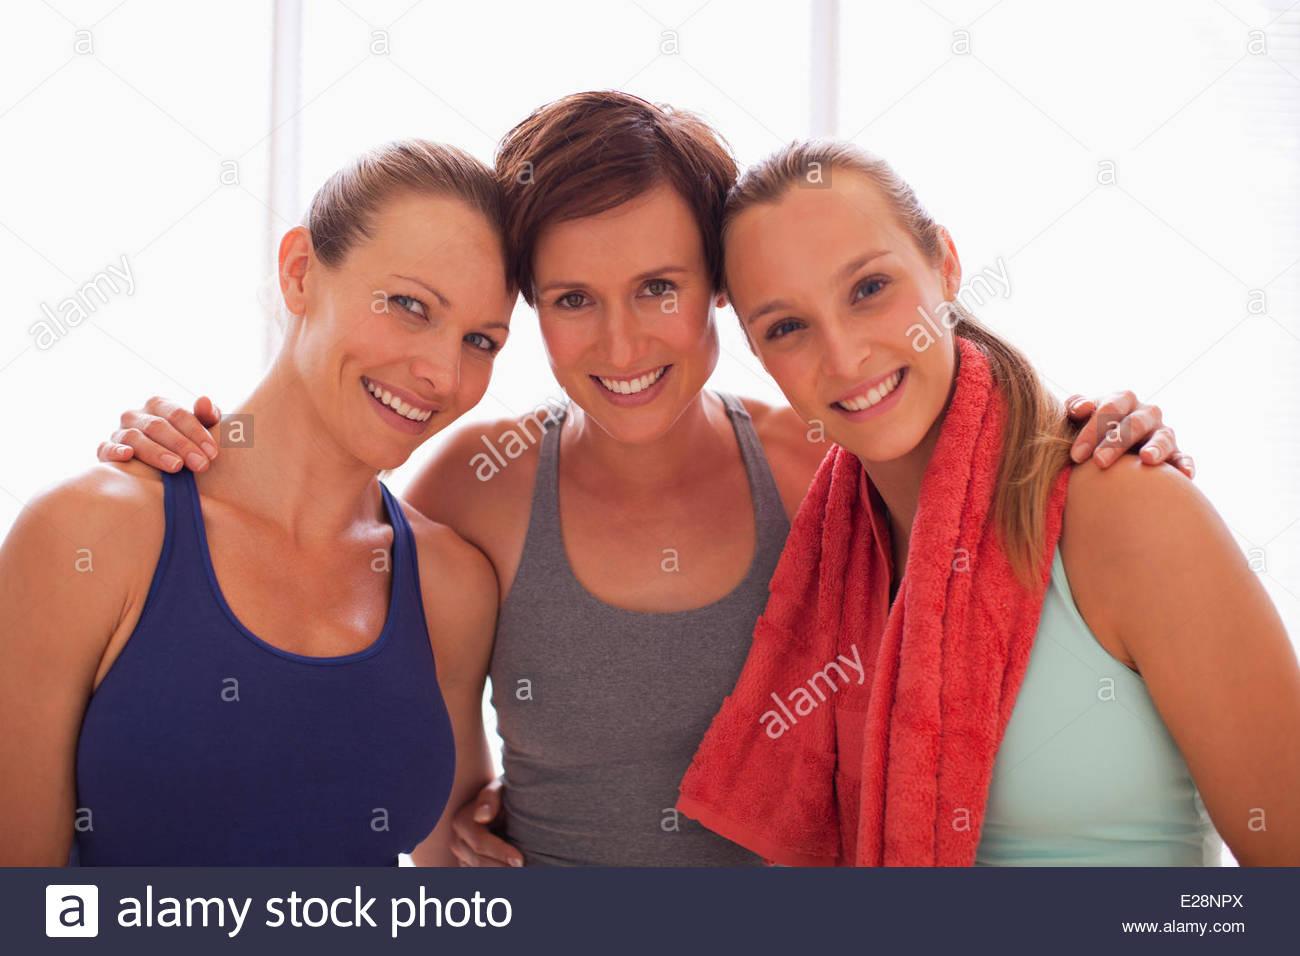 Portrait of smiling women hugging - Stock Image